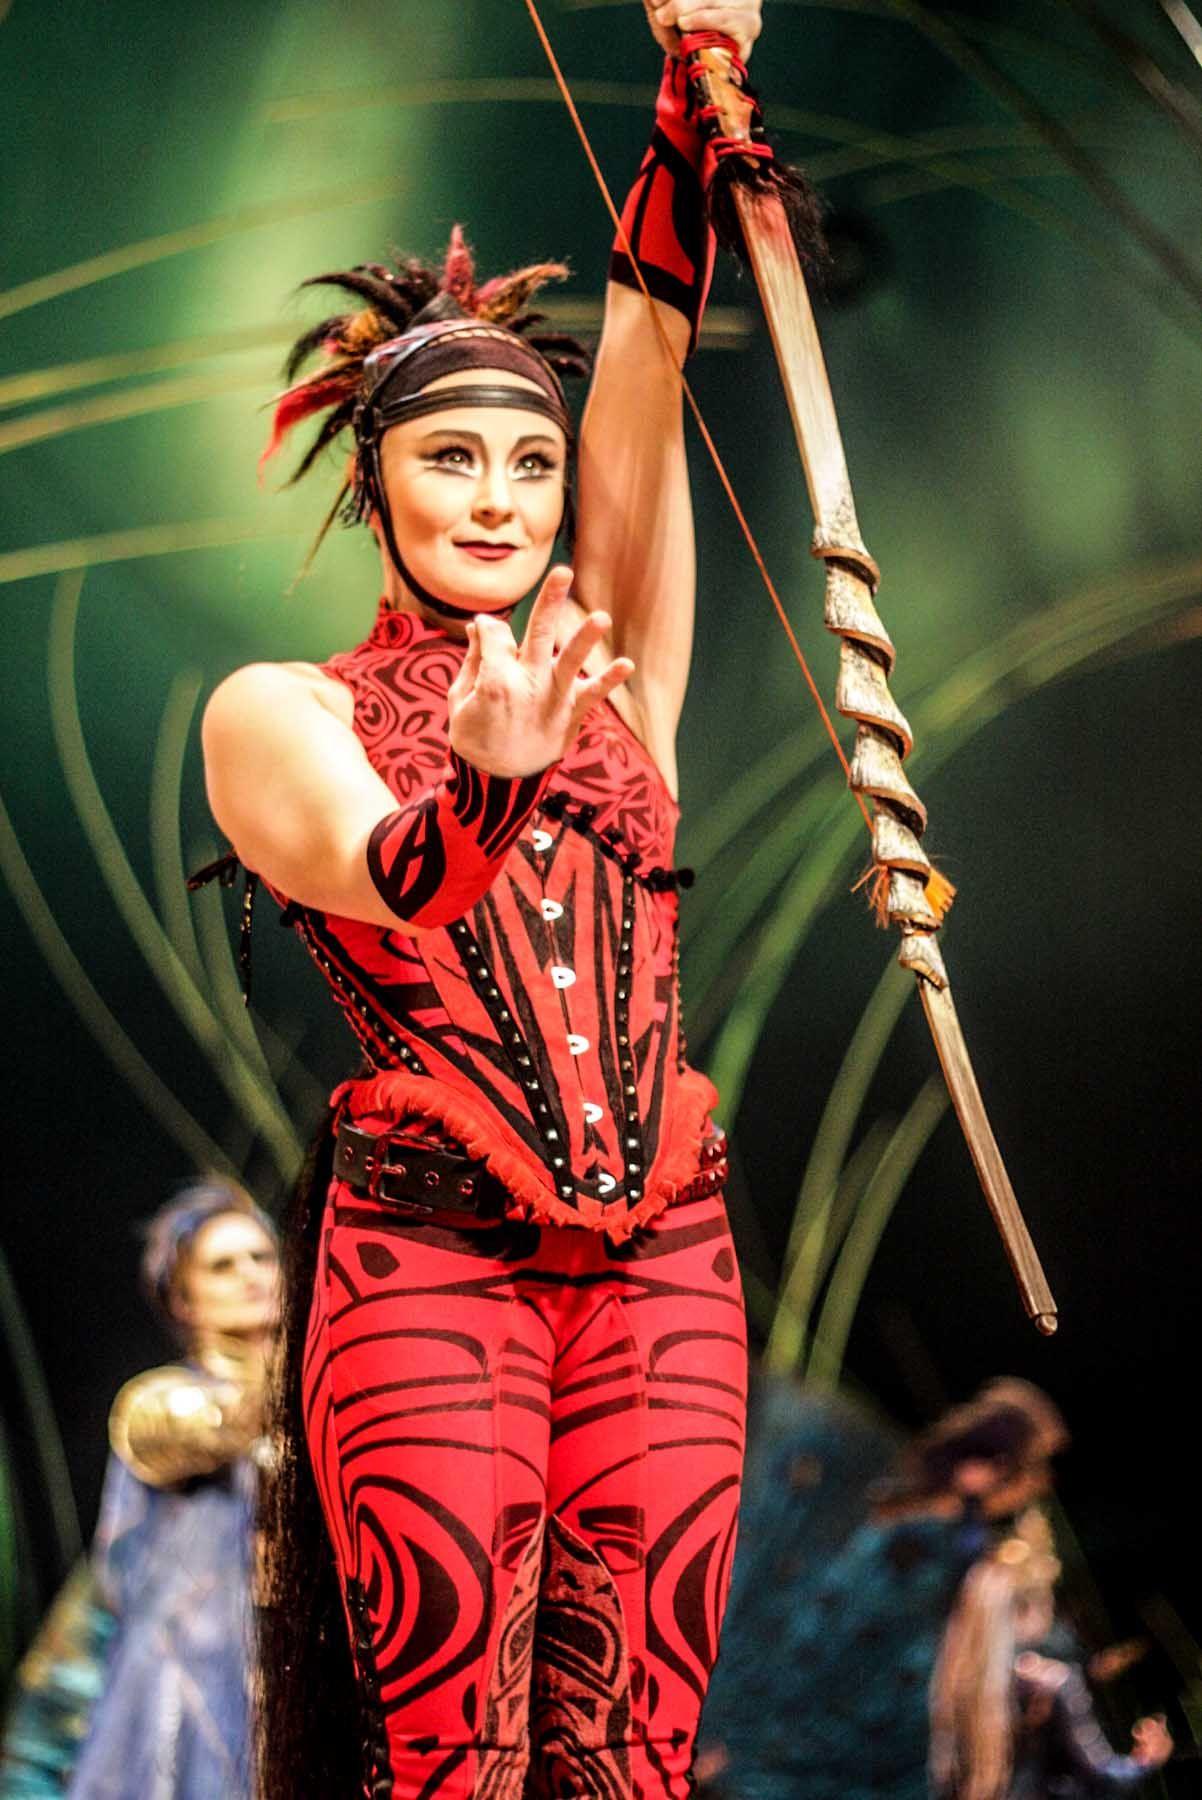 Cirque Du Soleil Amaluna Vancouver Nov 22 2012 Review And Photos By Christine Redmond Cirque Du Soleil Circus Costume Clown Costume